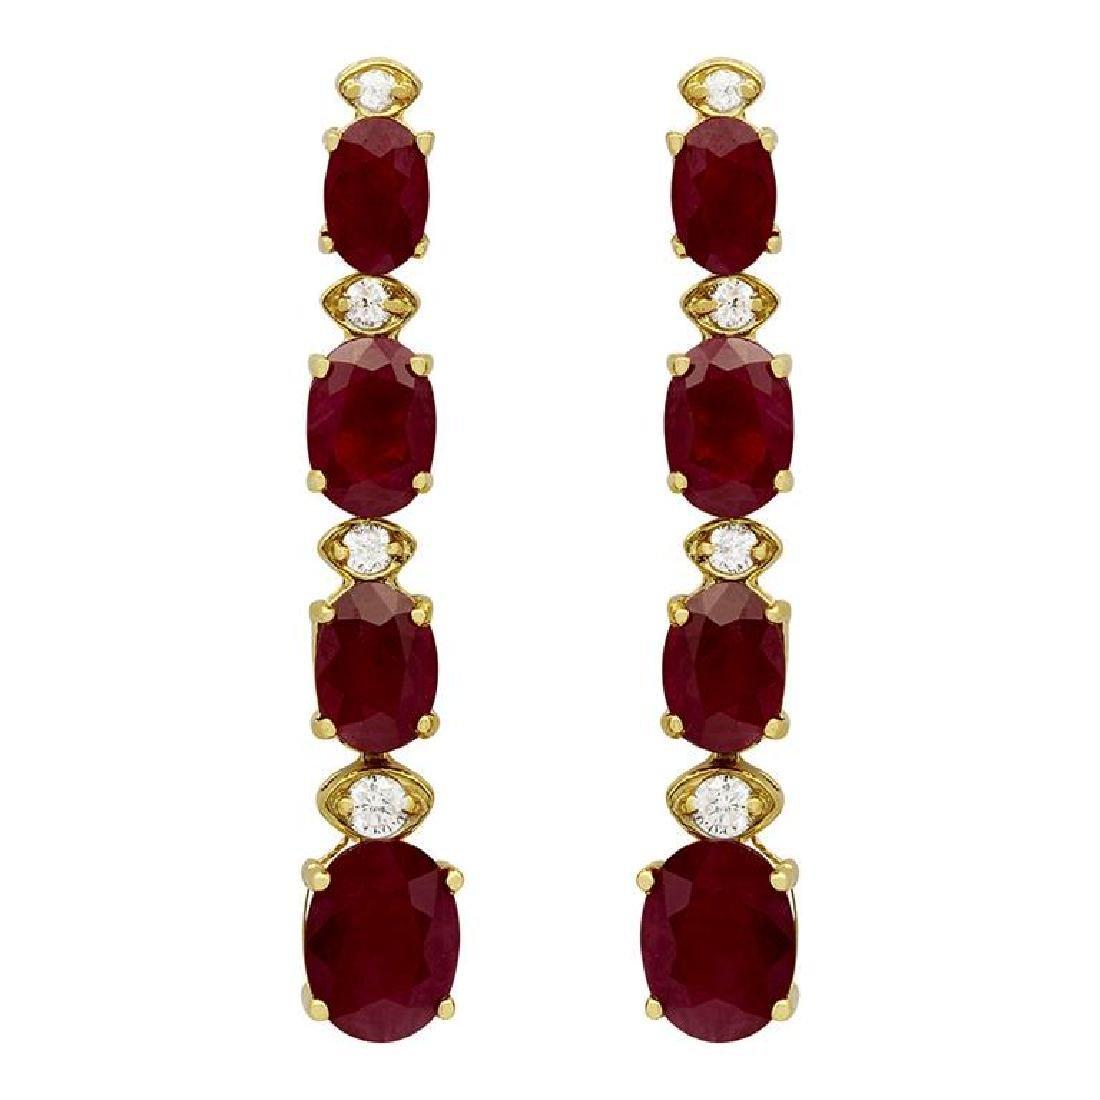 14k Yellow Gold 8.64ct Ruby 0.26ct Diamond Earrings